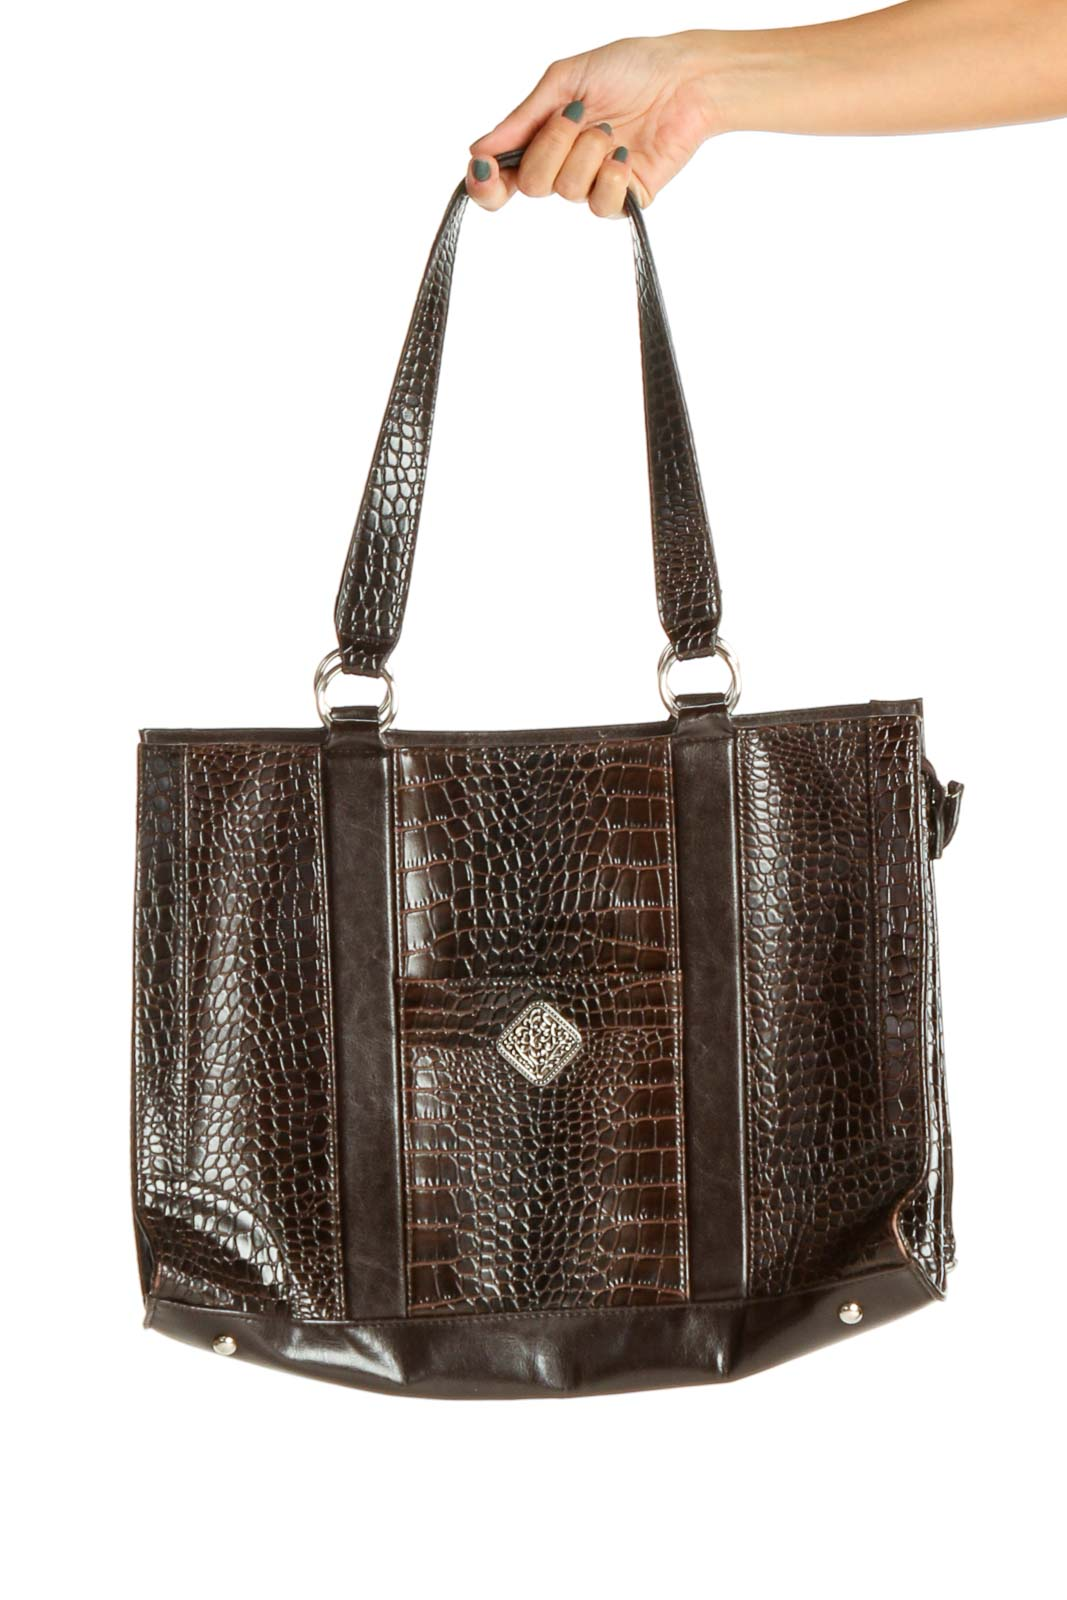 Brown Tote Bag Front